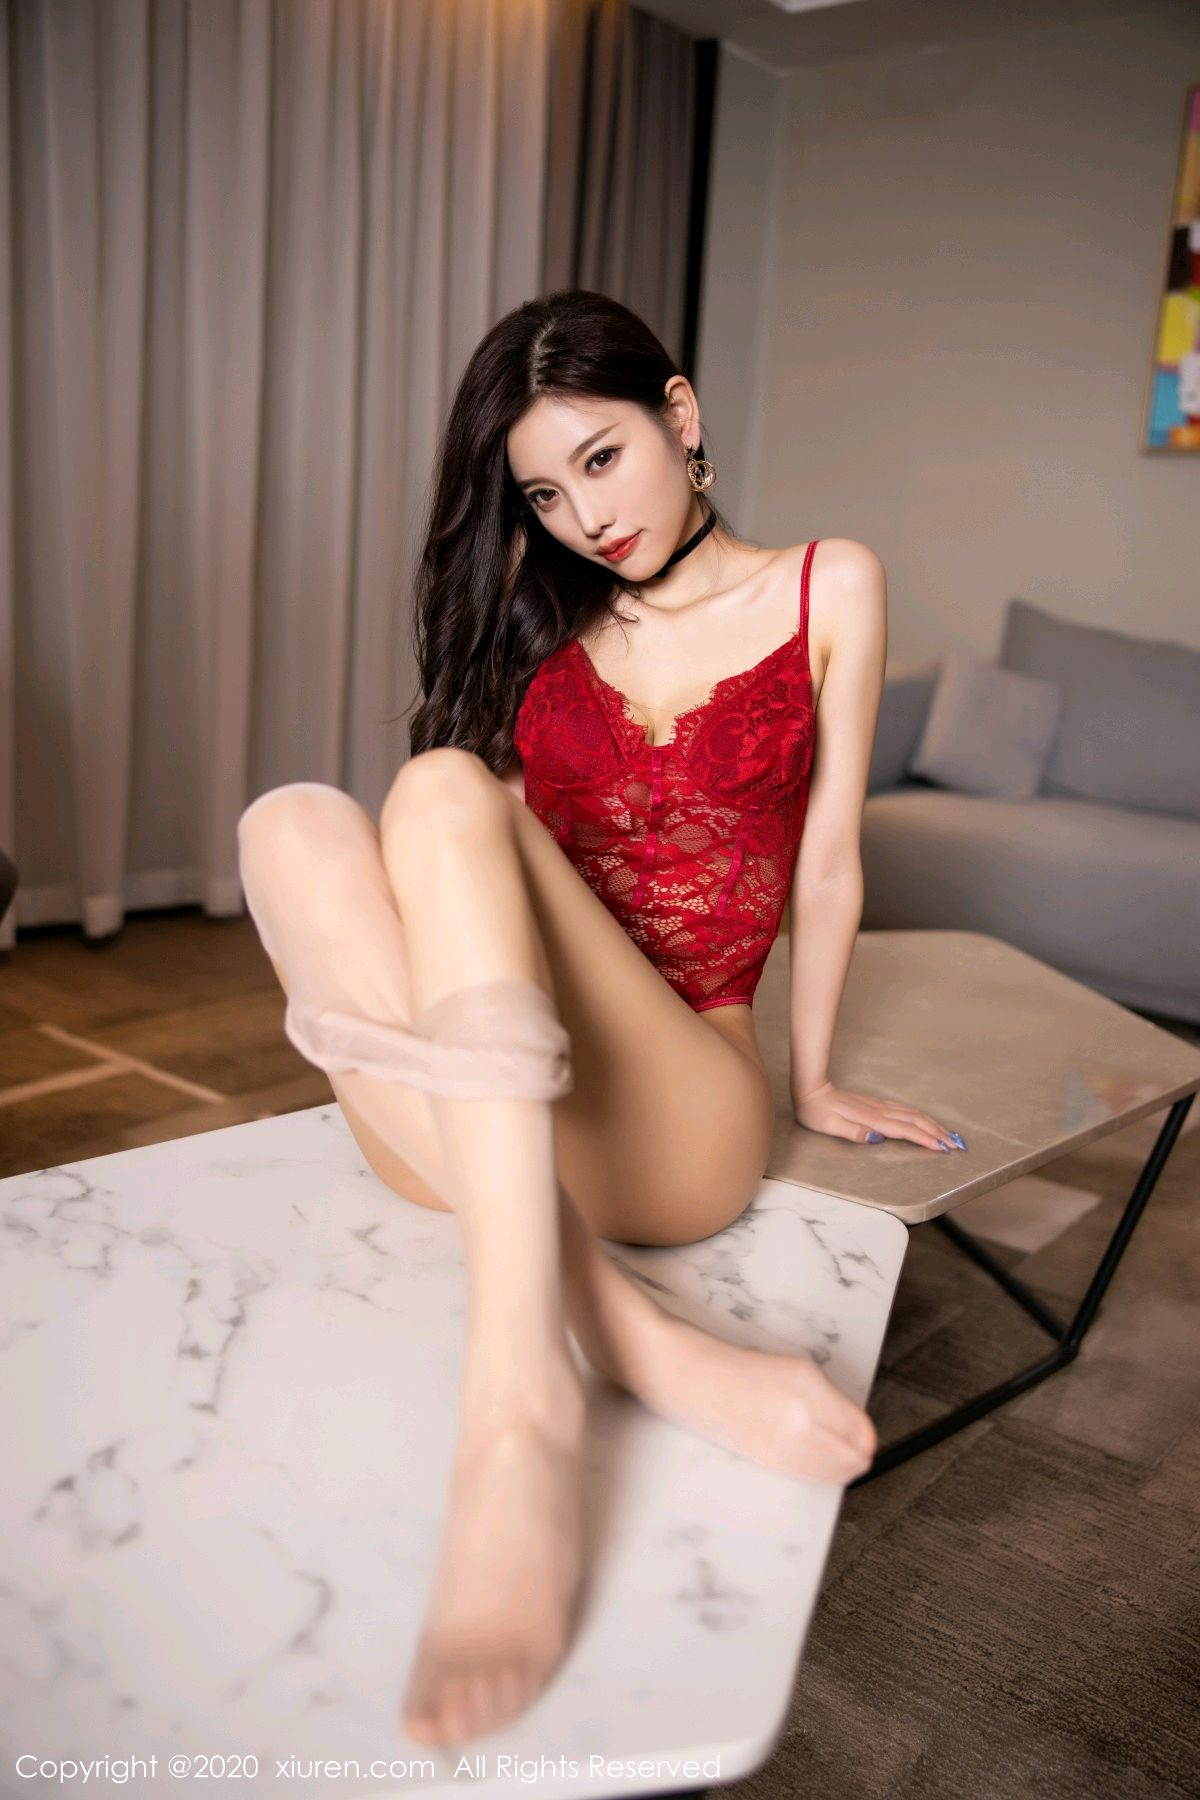 [XiuRen] Vol.2671 Yang Chen Chen 78P, Underwear, Xiuren, Yang Chen Chen